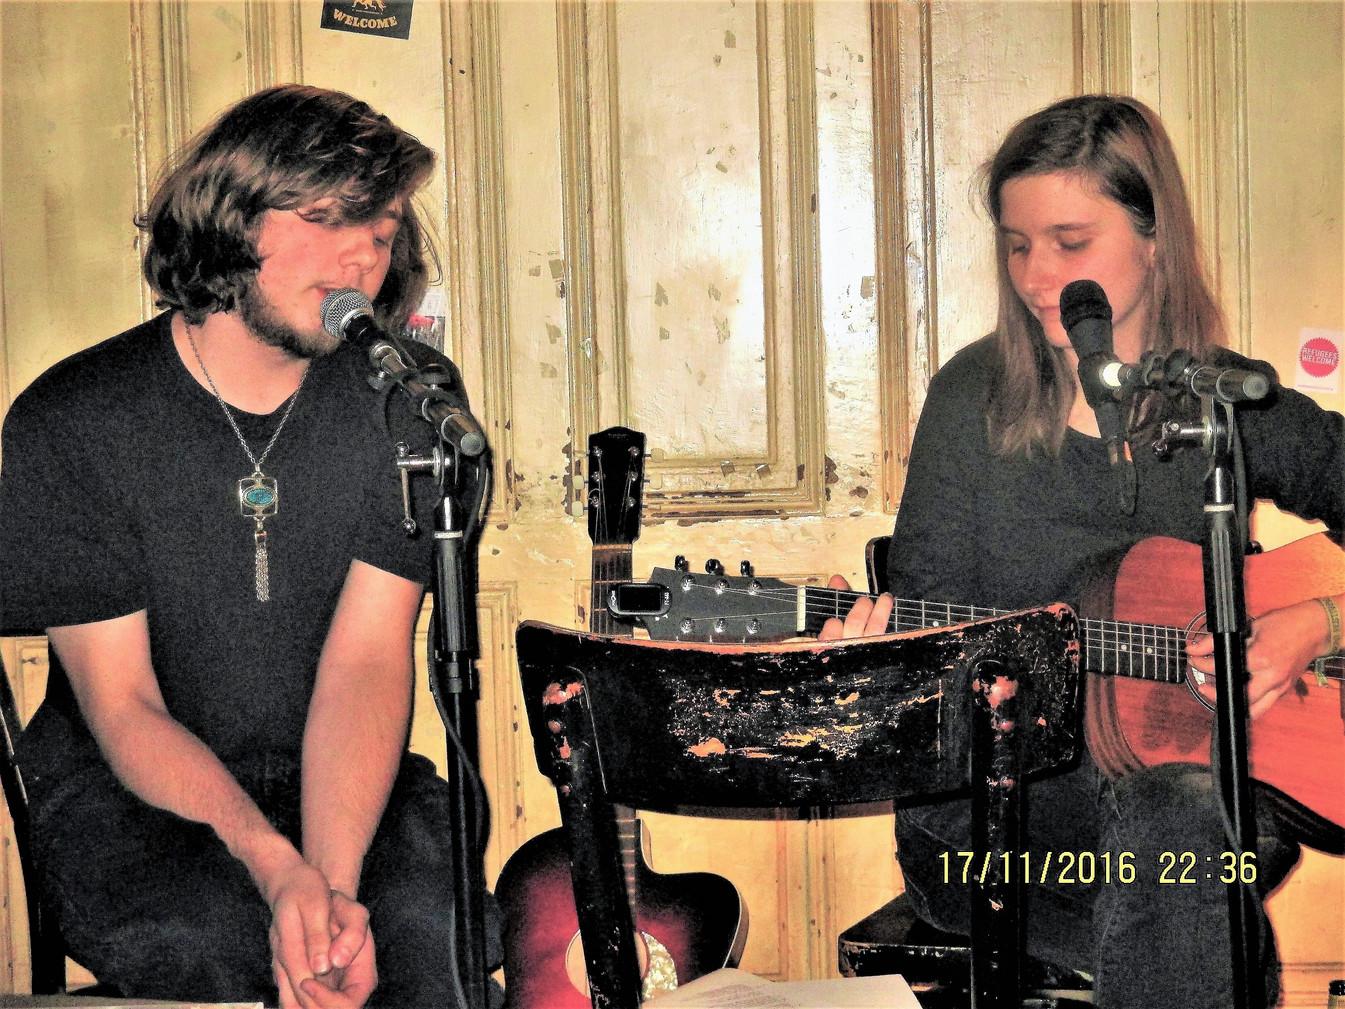 Mario Schlager & Katharina Pichlmayer